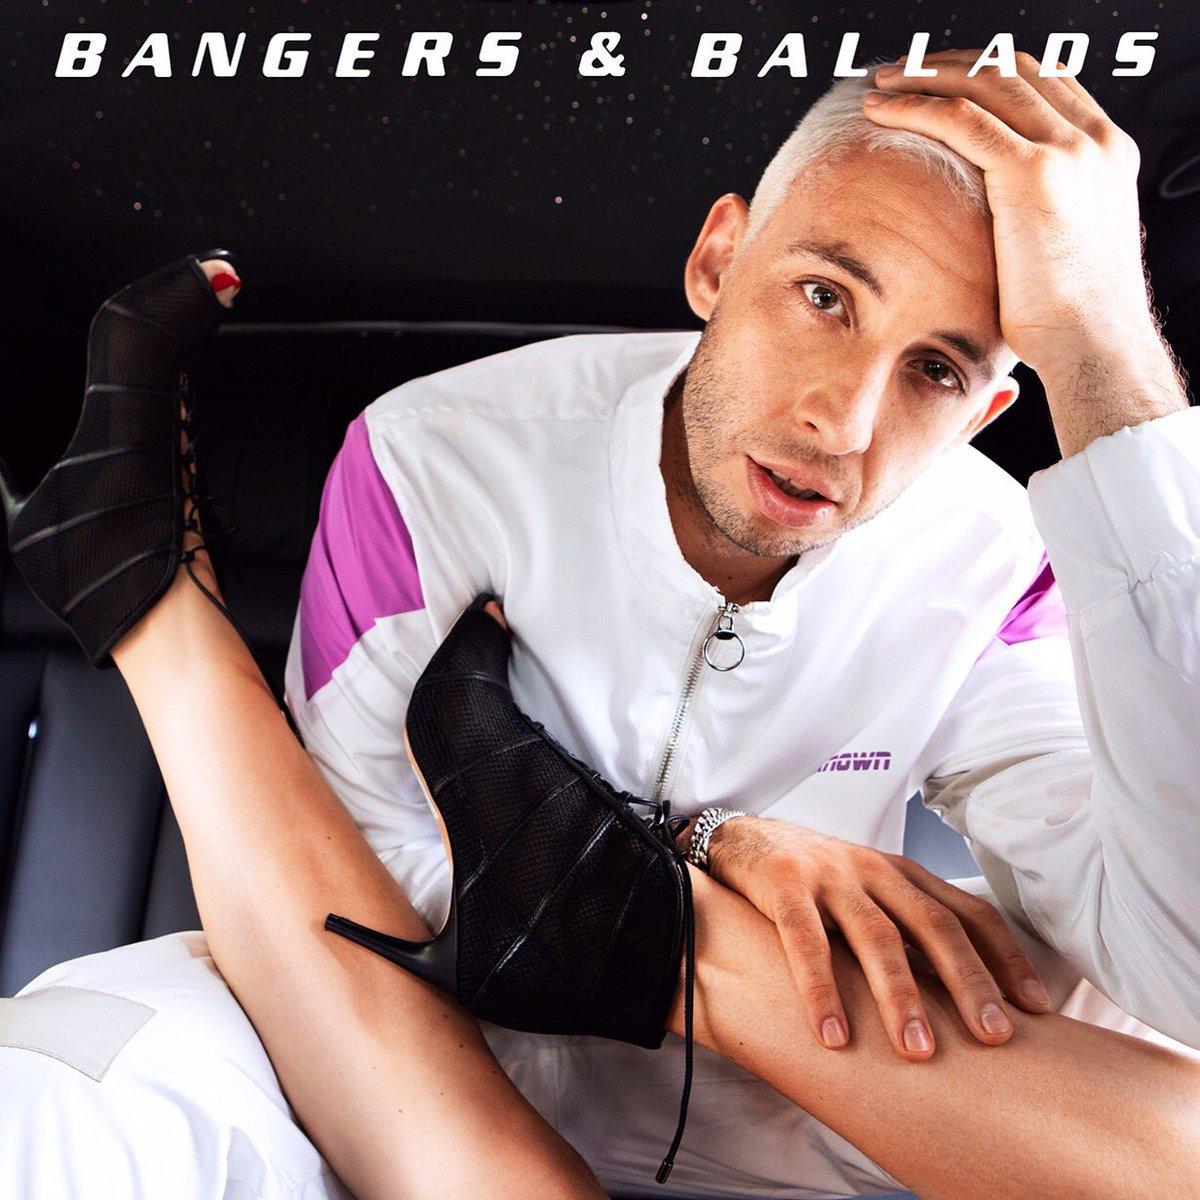 bangers and ballads.jpg